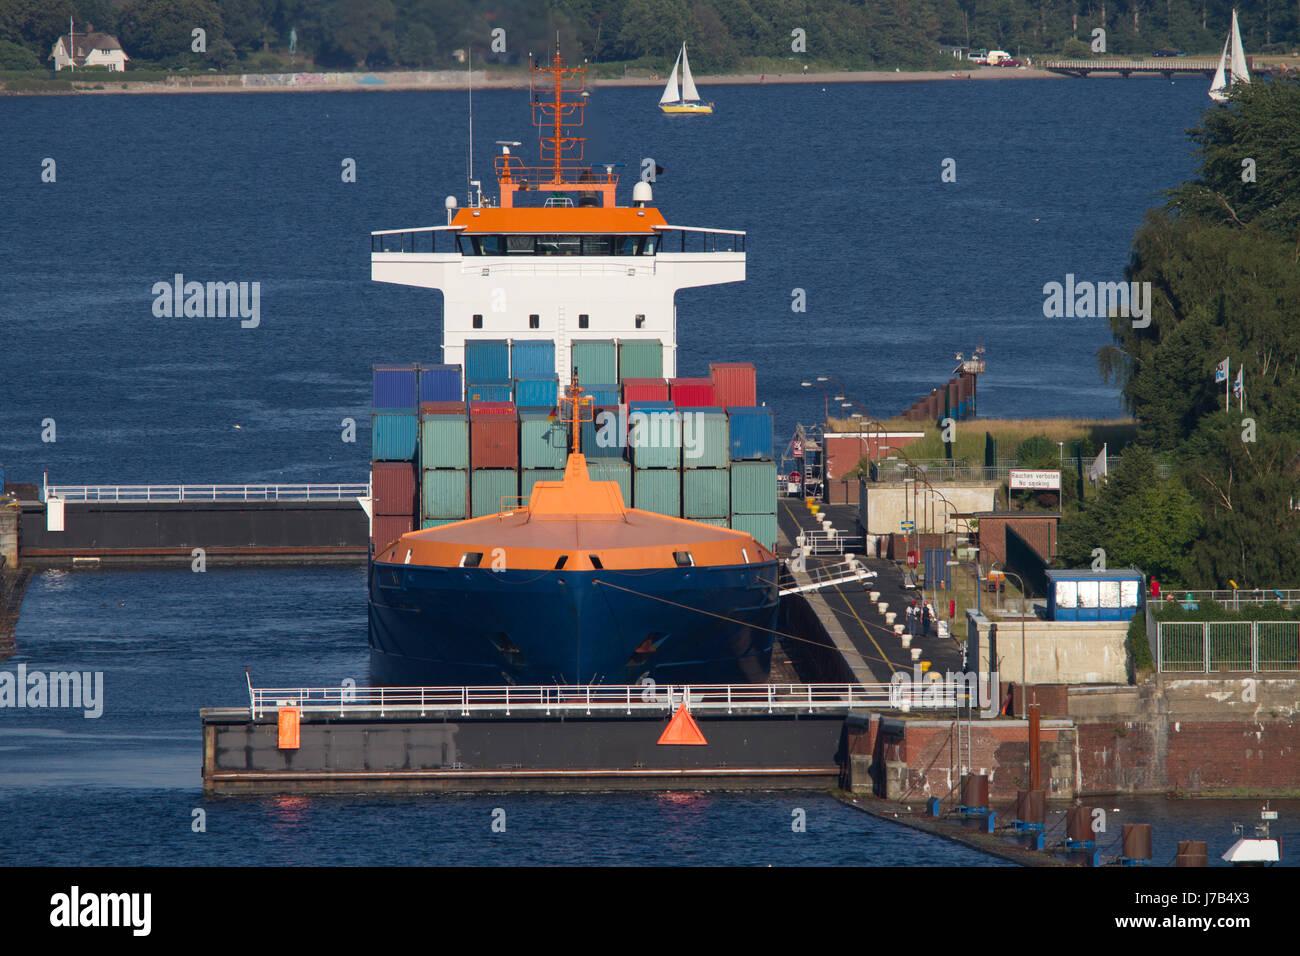 container ship logistics keel sailing boat sailboat rowing boat boat watercraft Stock Photo